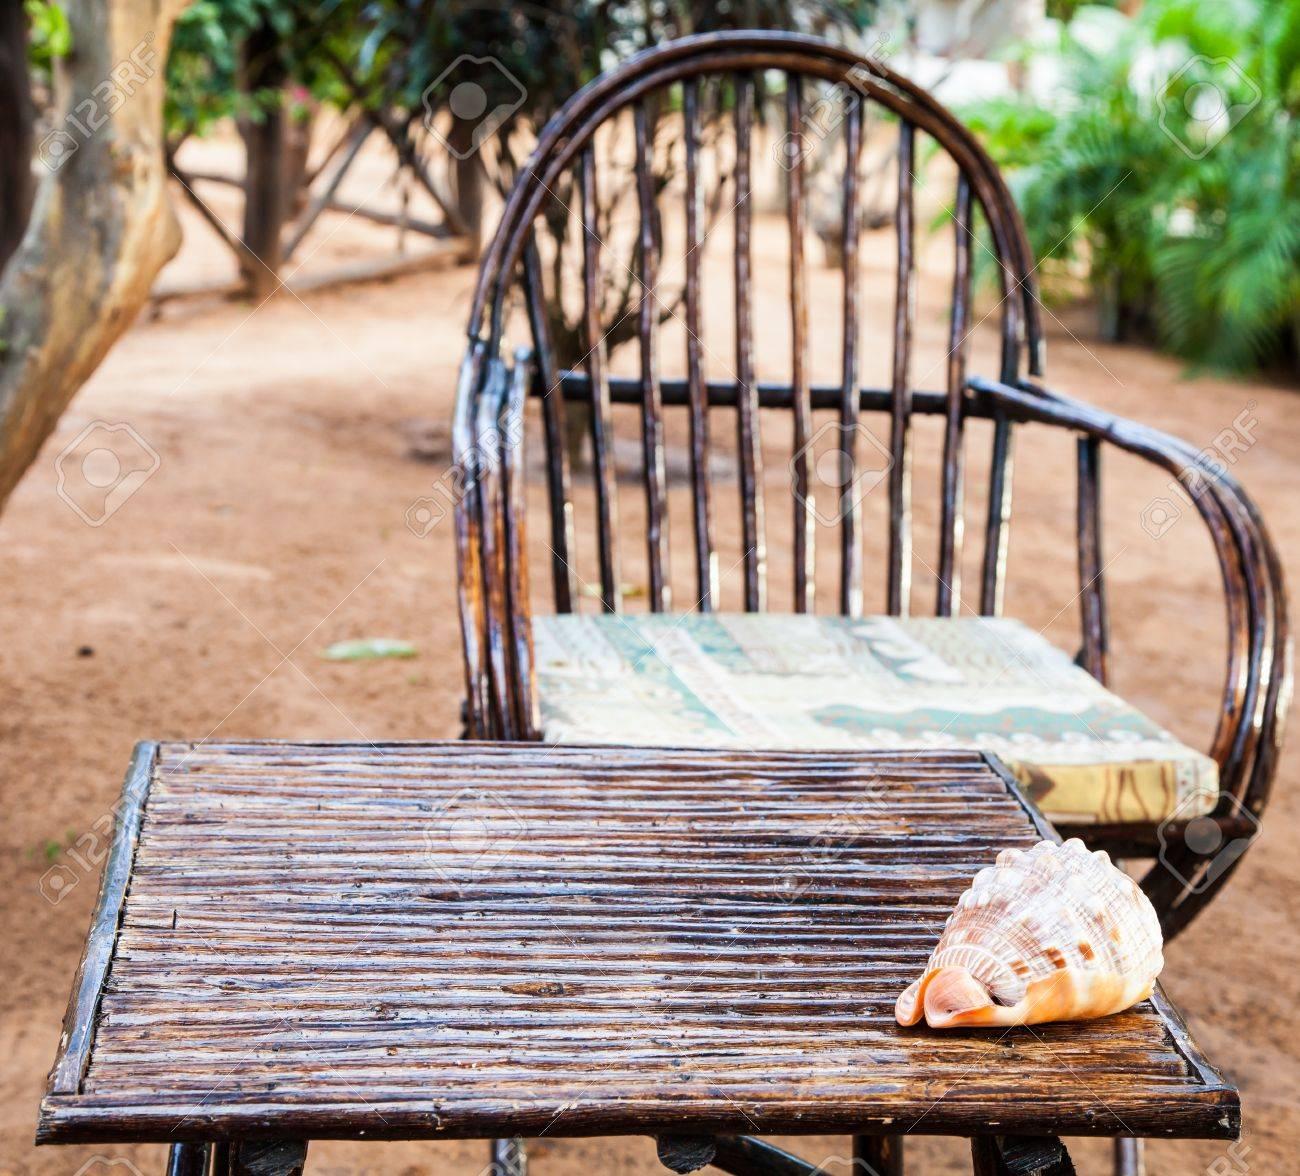 African Garden Furniture Kenya elegant furniture made of wood in an african garden stock elegant furniture made of wood in an african garden stock photo 20612623 workwithnaturefo